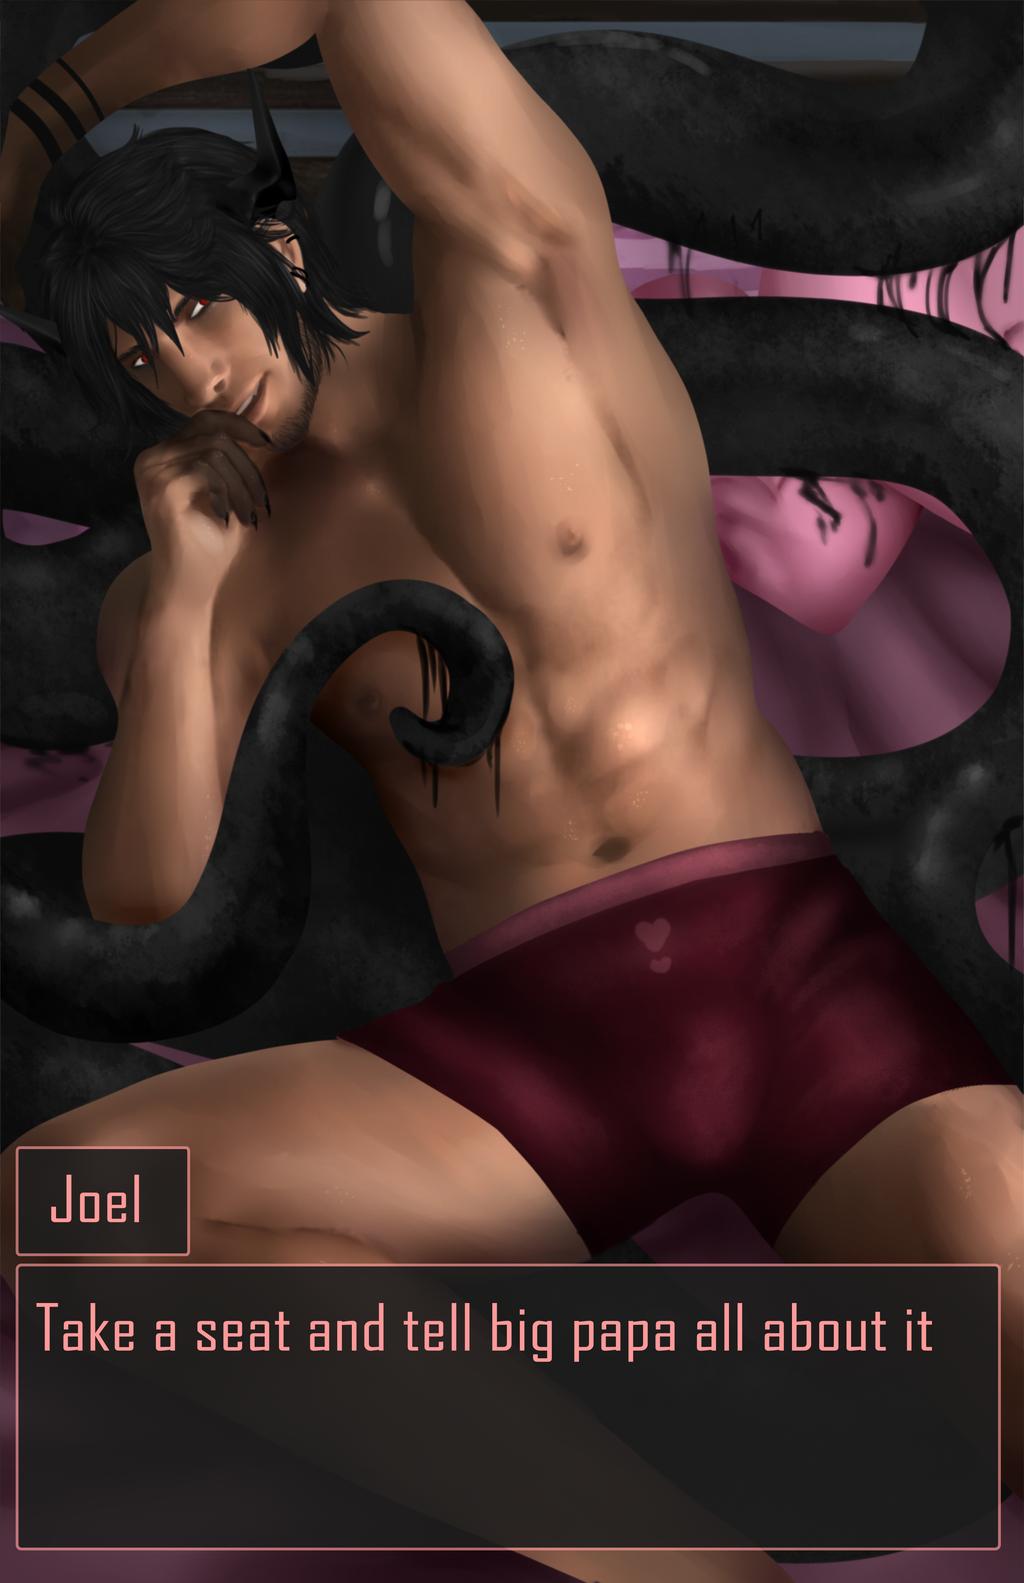 Dating Sim Valentines Joel by Qu-Ross